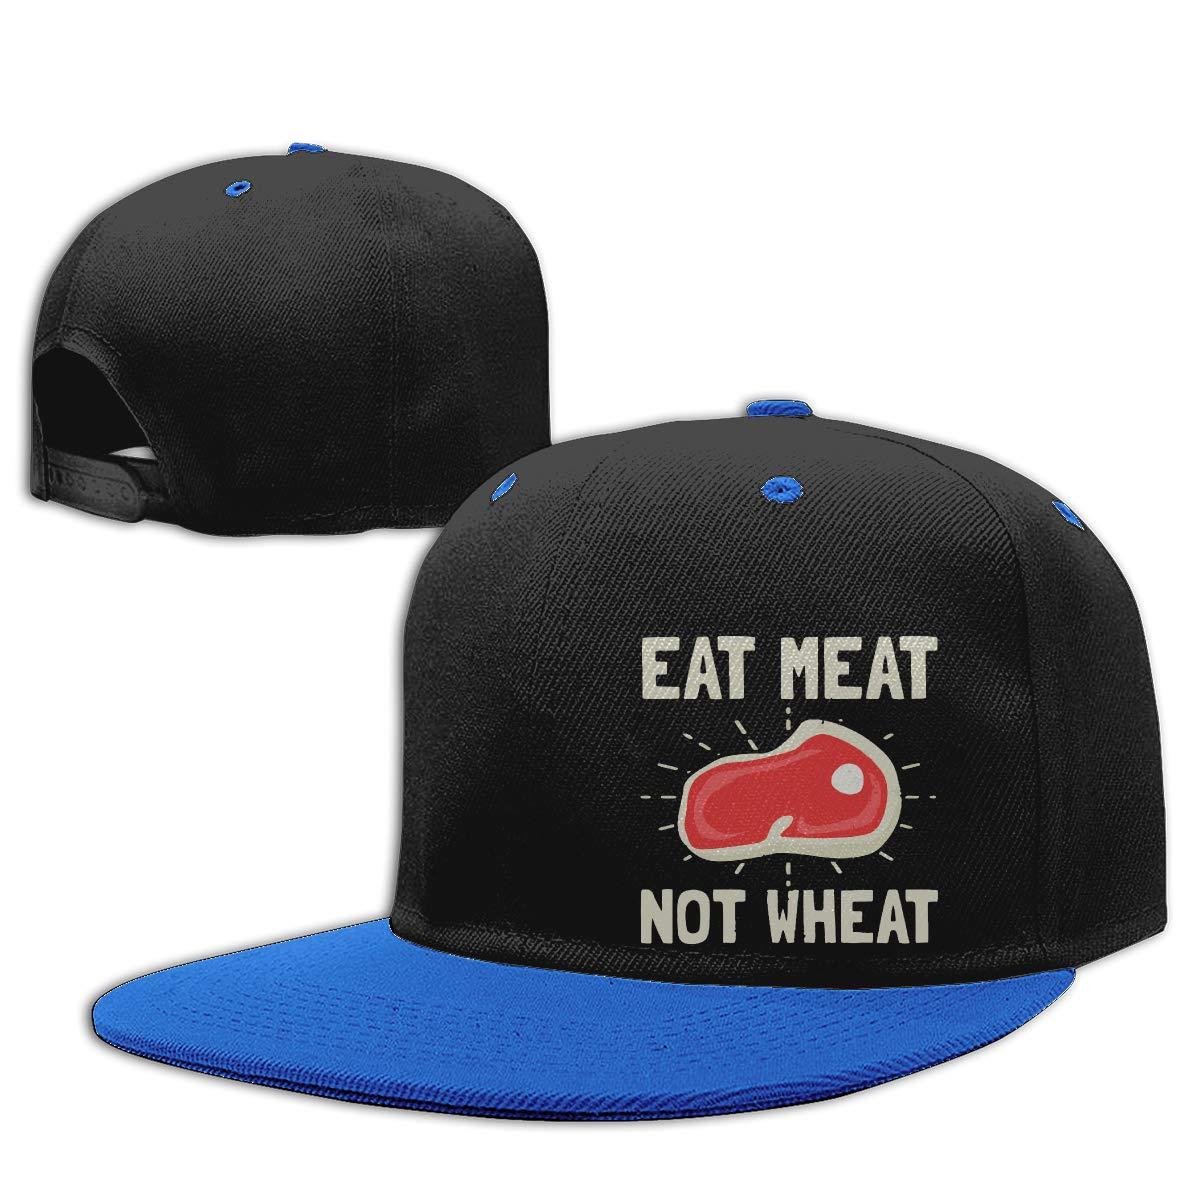 Women Men Punk Rock Cap Eat Meat Not Wheat Adults Flat Peaked Baseball Caps